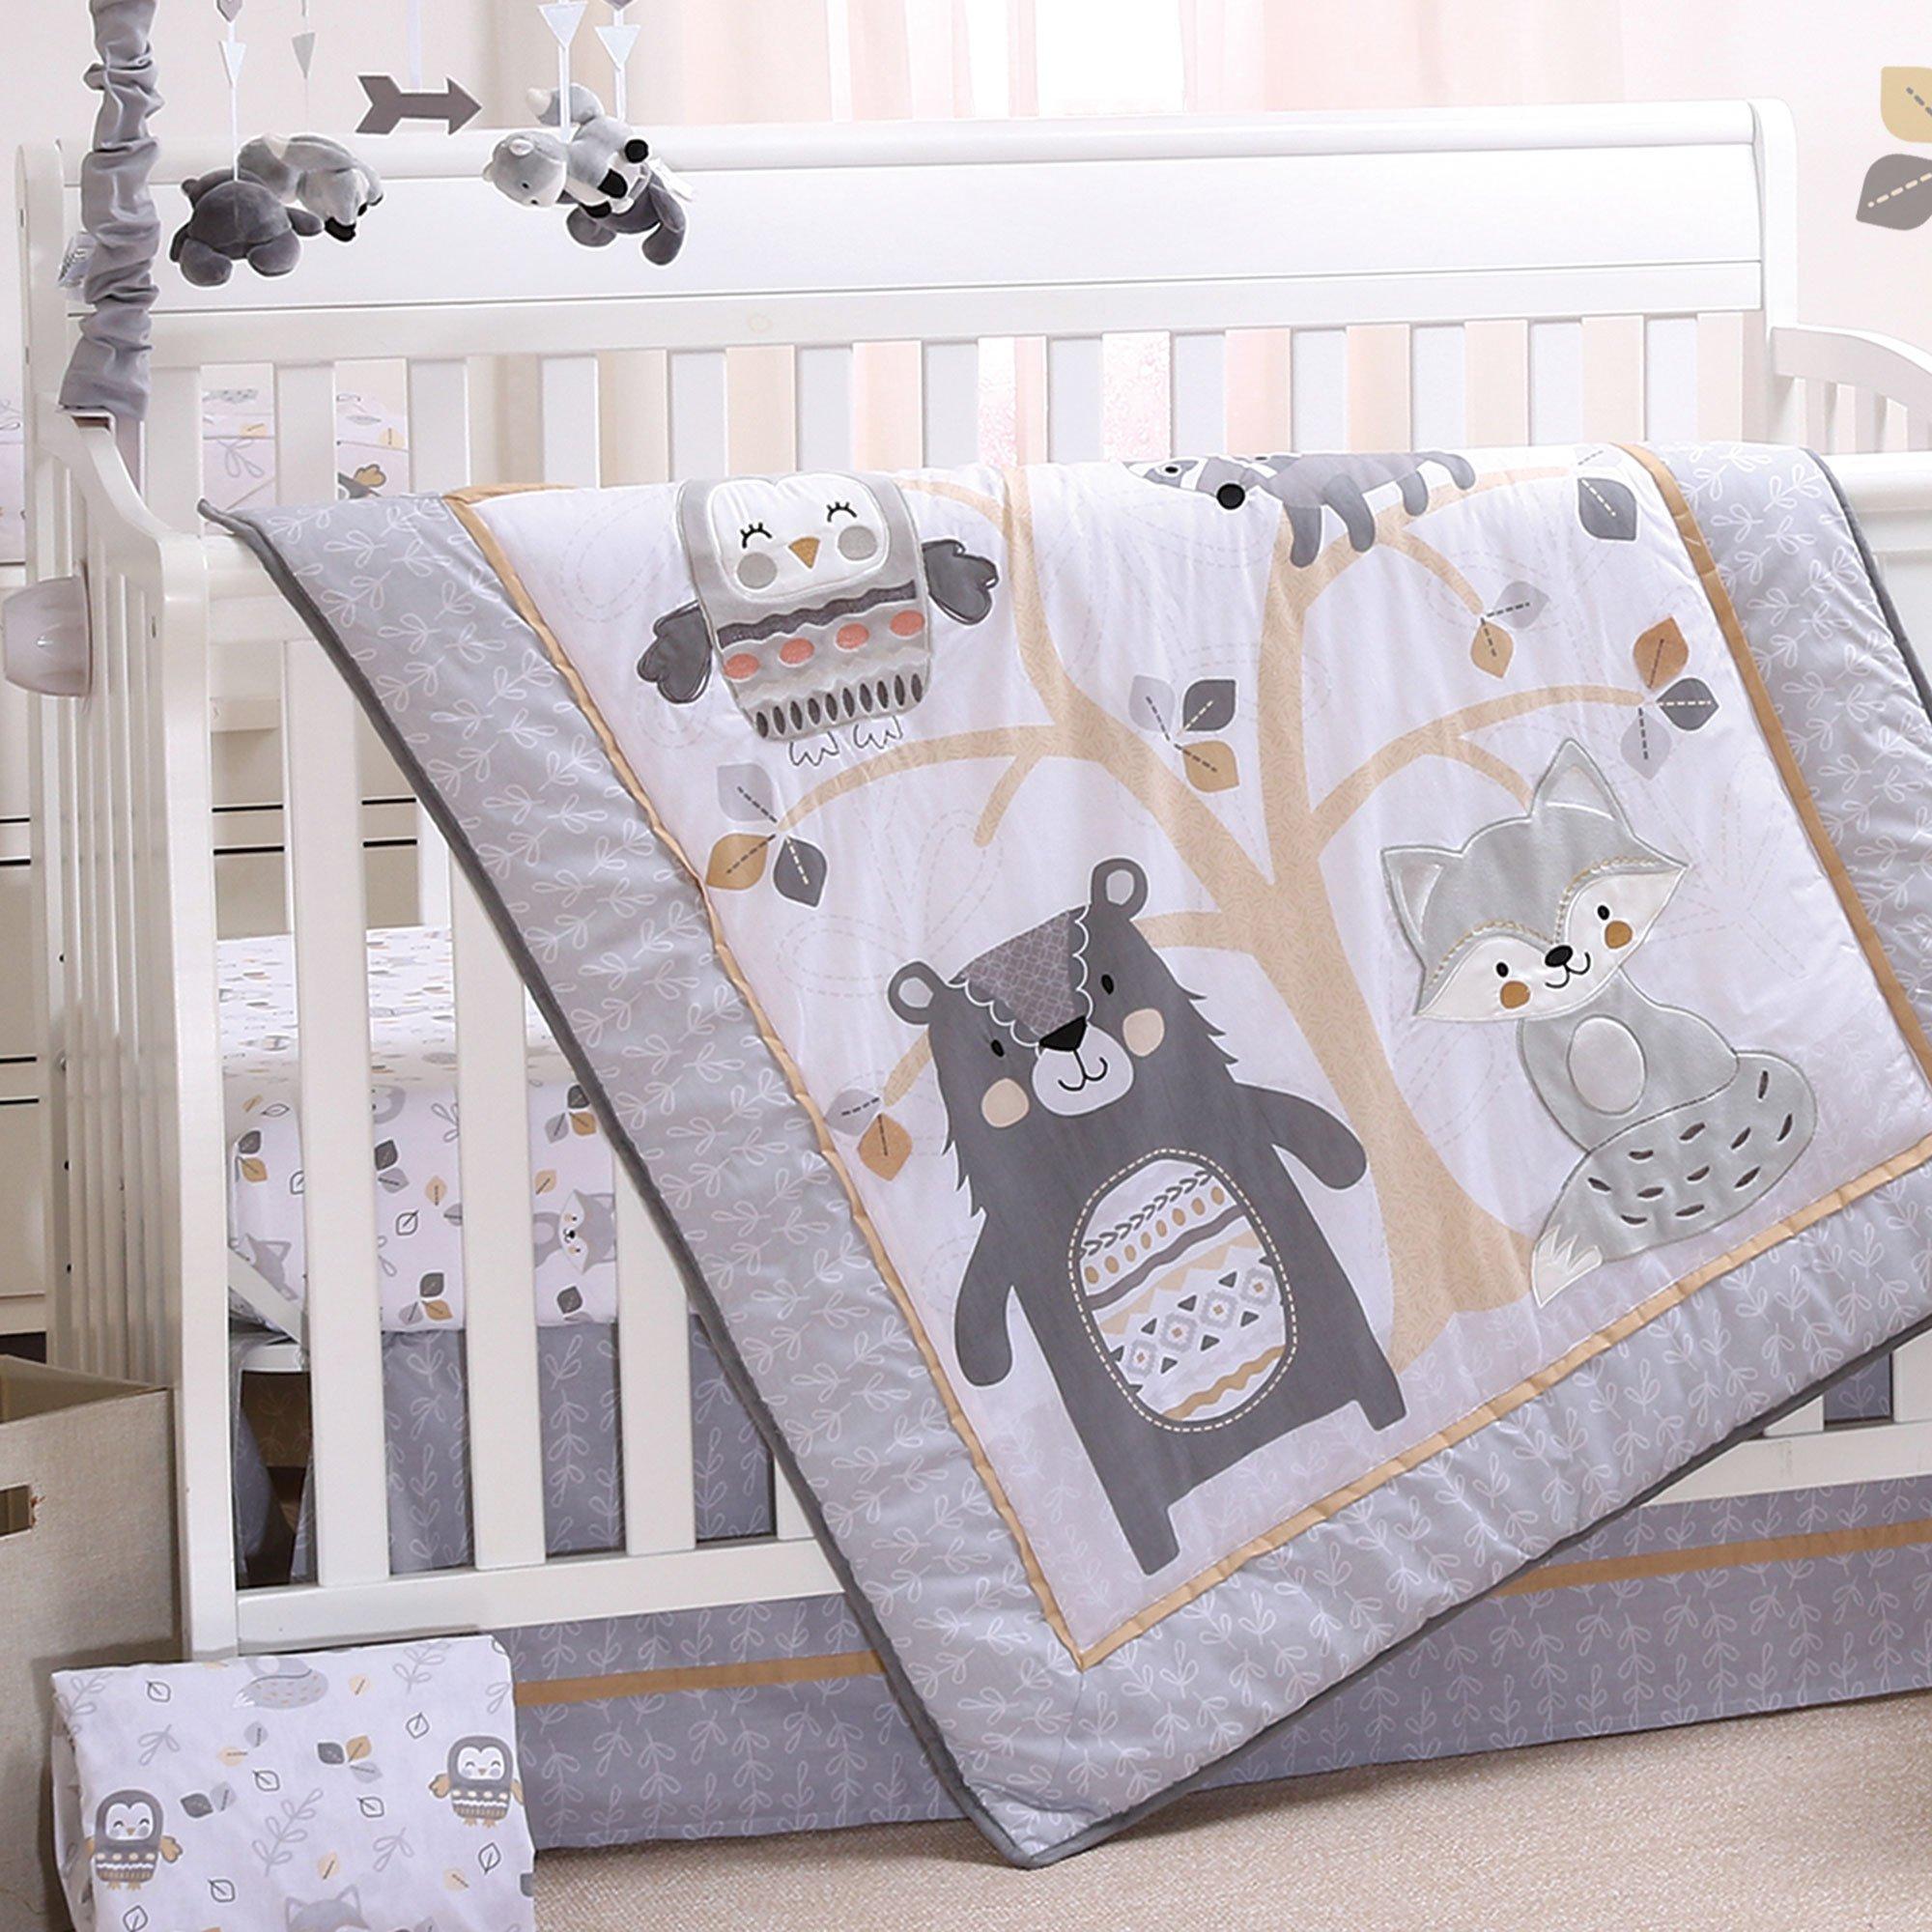 Woodland Friends 3 Piece Forest Animal Theme Baby Crib Bedding Set - Grey, Tan